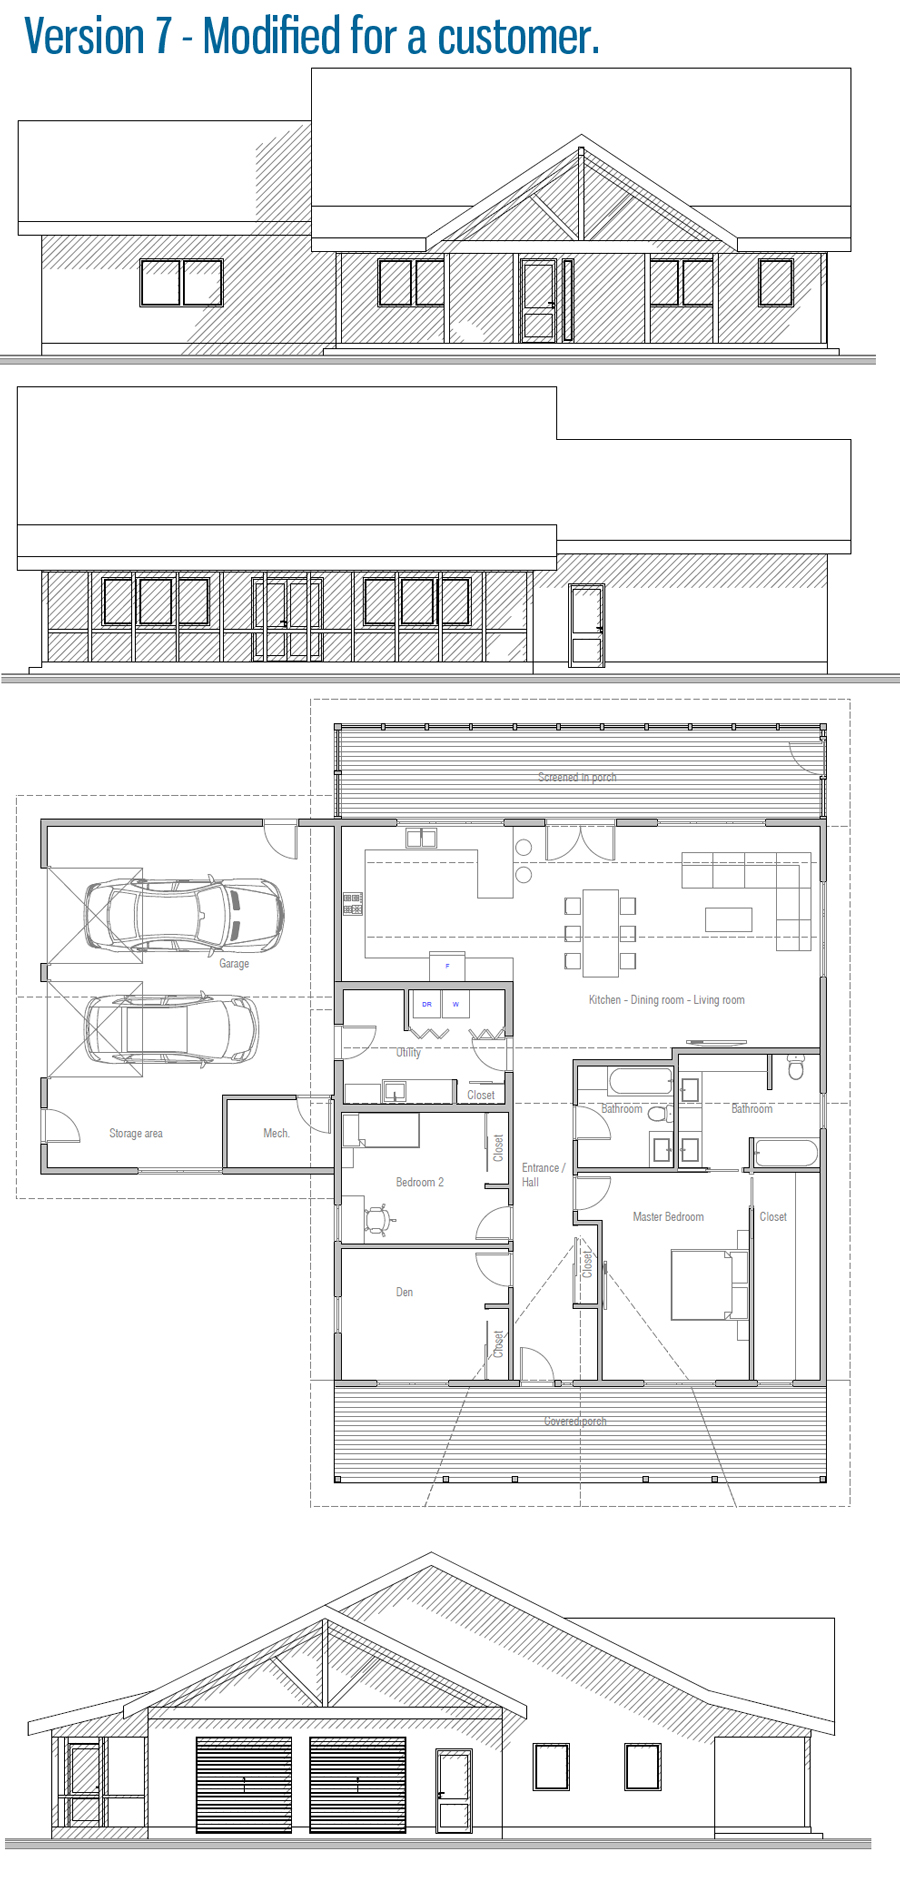 affordable-homes_55_HOUSE_PLAN_CH598_V7.jpg